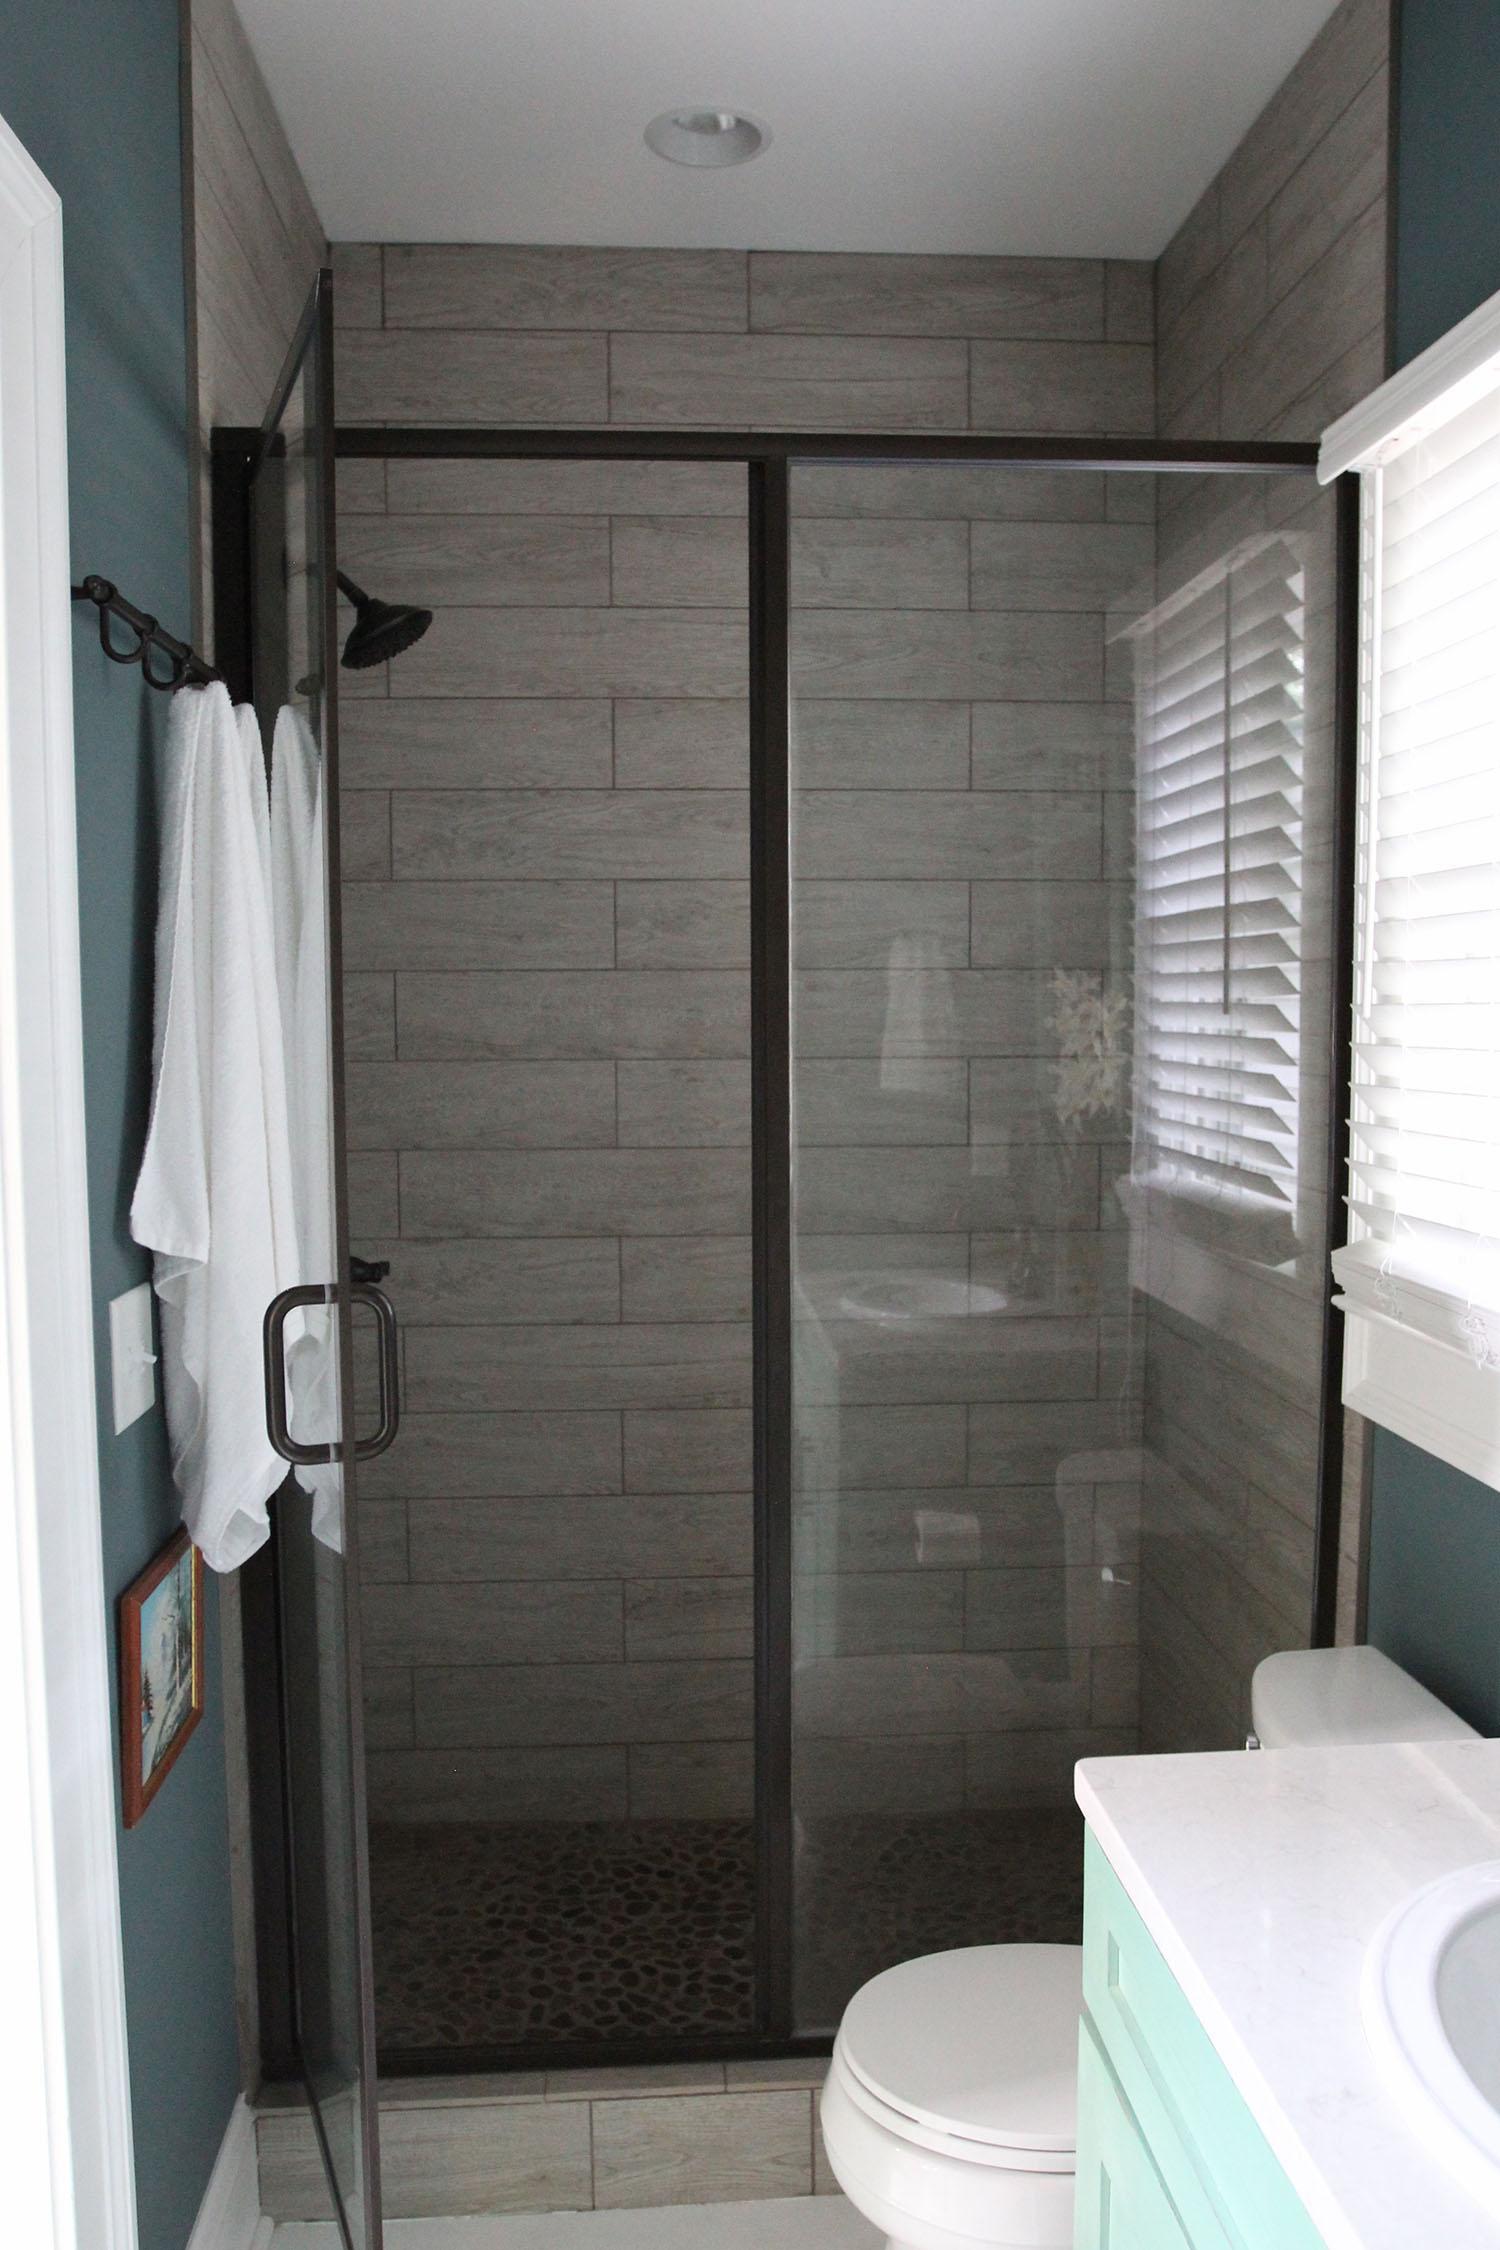 jo-torrijos-states-of-reverie-atlanta-airbnb-modern-bungalow23.jpg